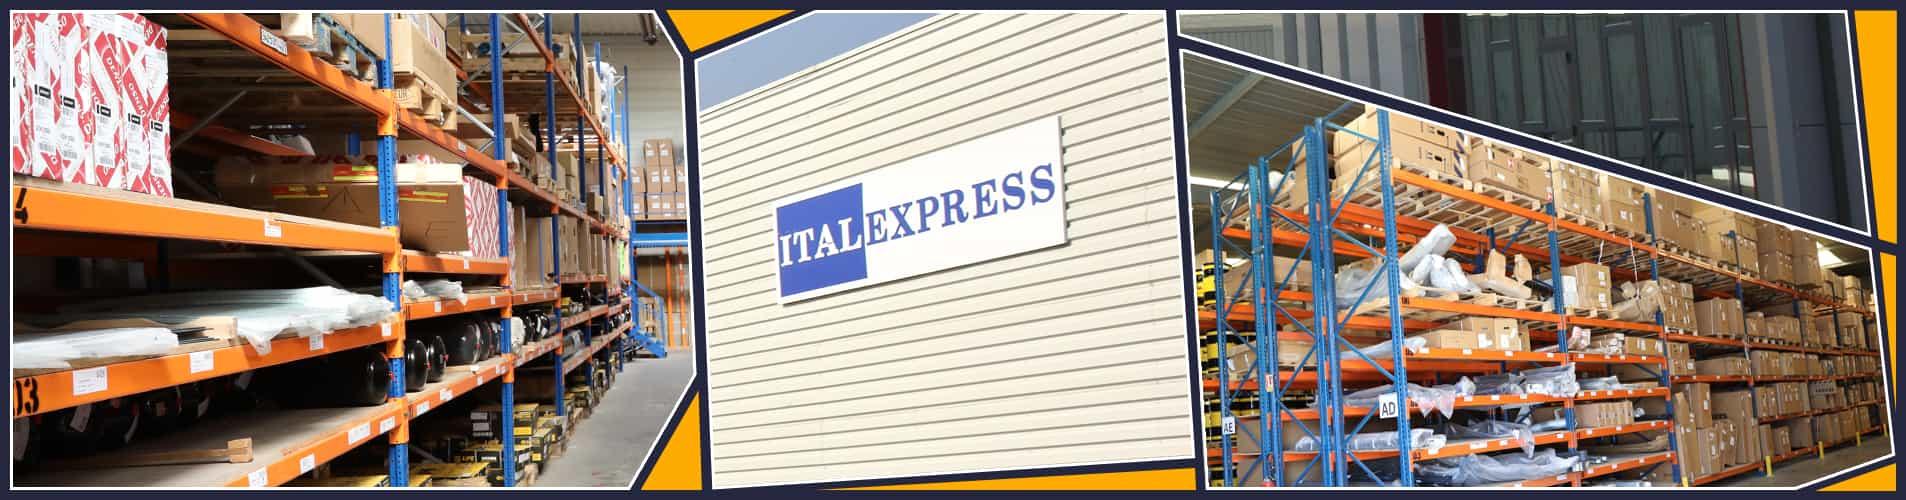 ITAL EXPRESS